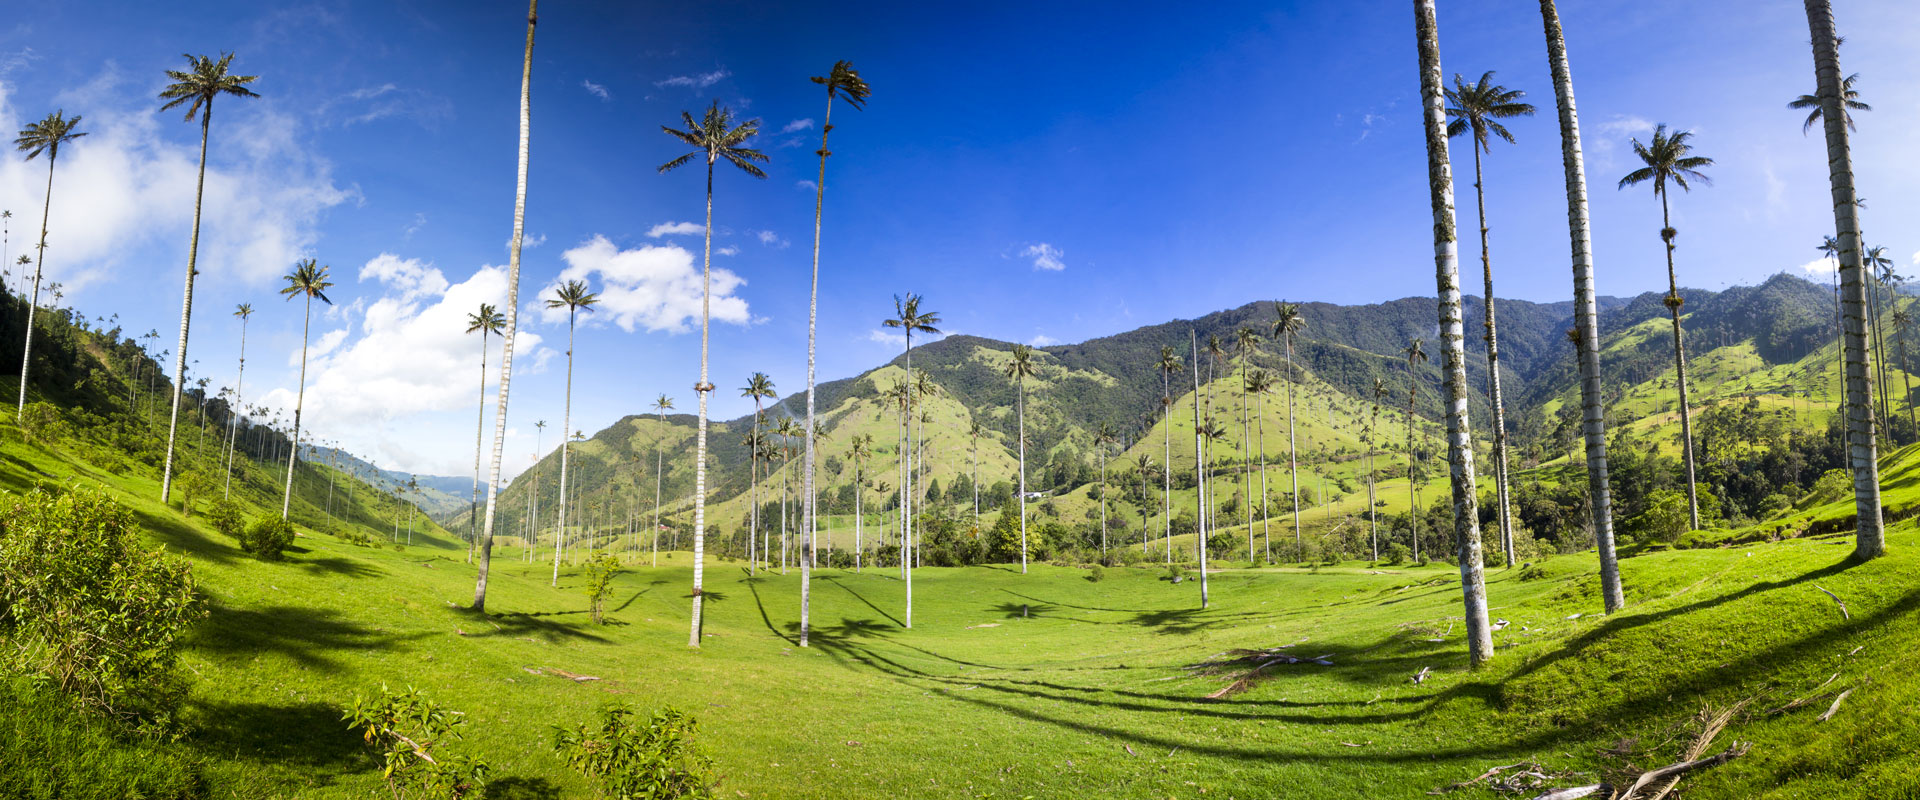 Colombie | Vallée de Cocora